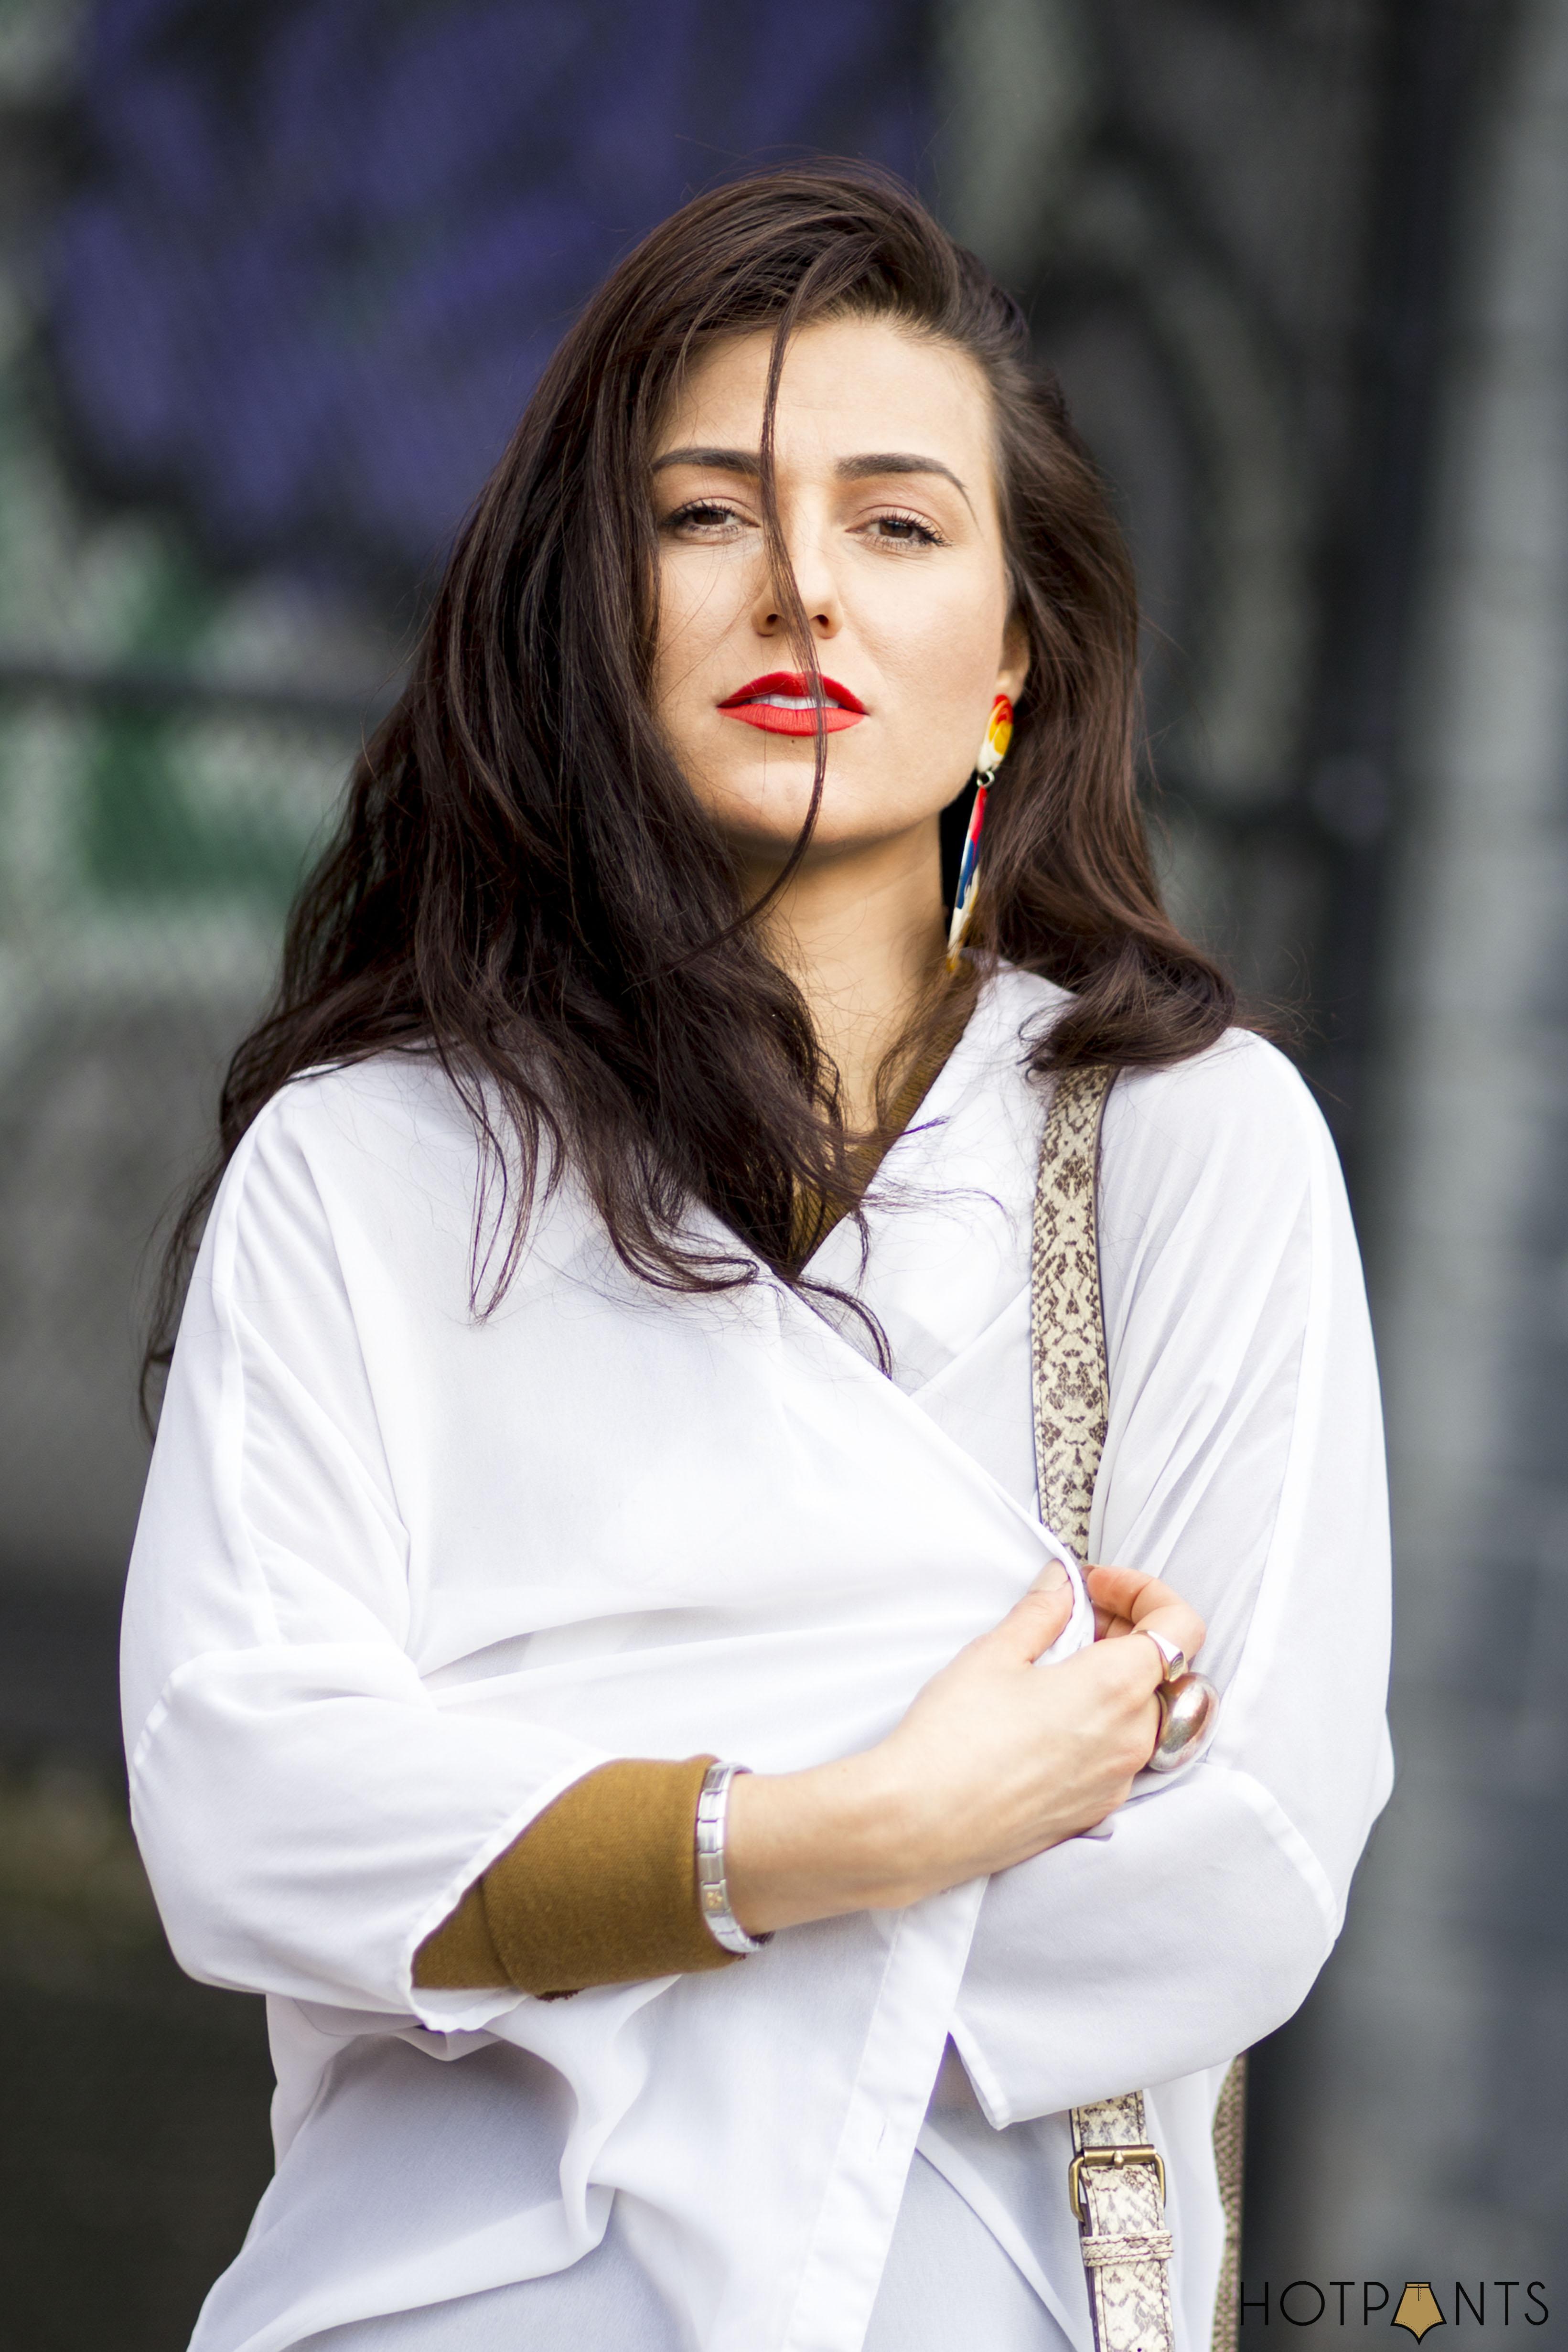 Long Hair Blogger MAC Lady Danger Red Lipstick Wood Platform Heels Wedge